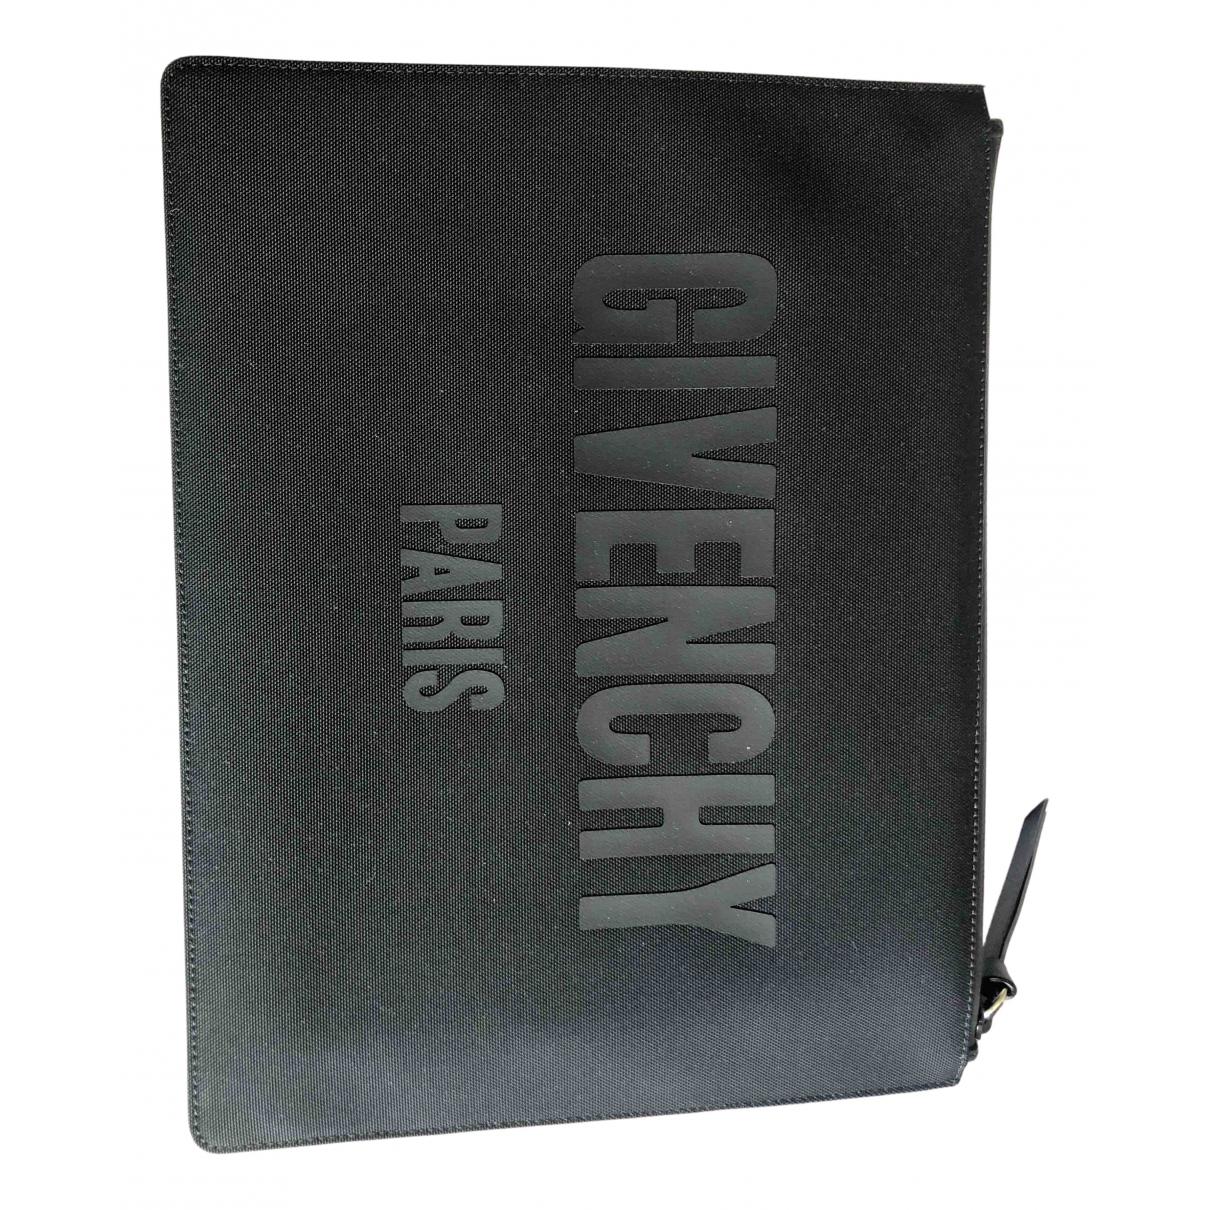 Givenchy \N Clutch in  Schwarz Baumwolle